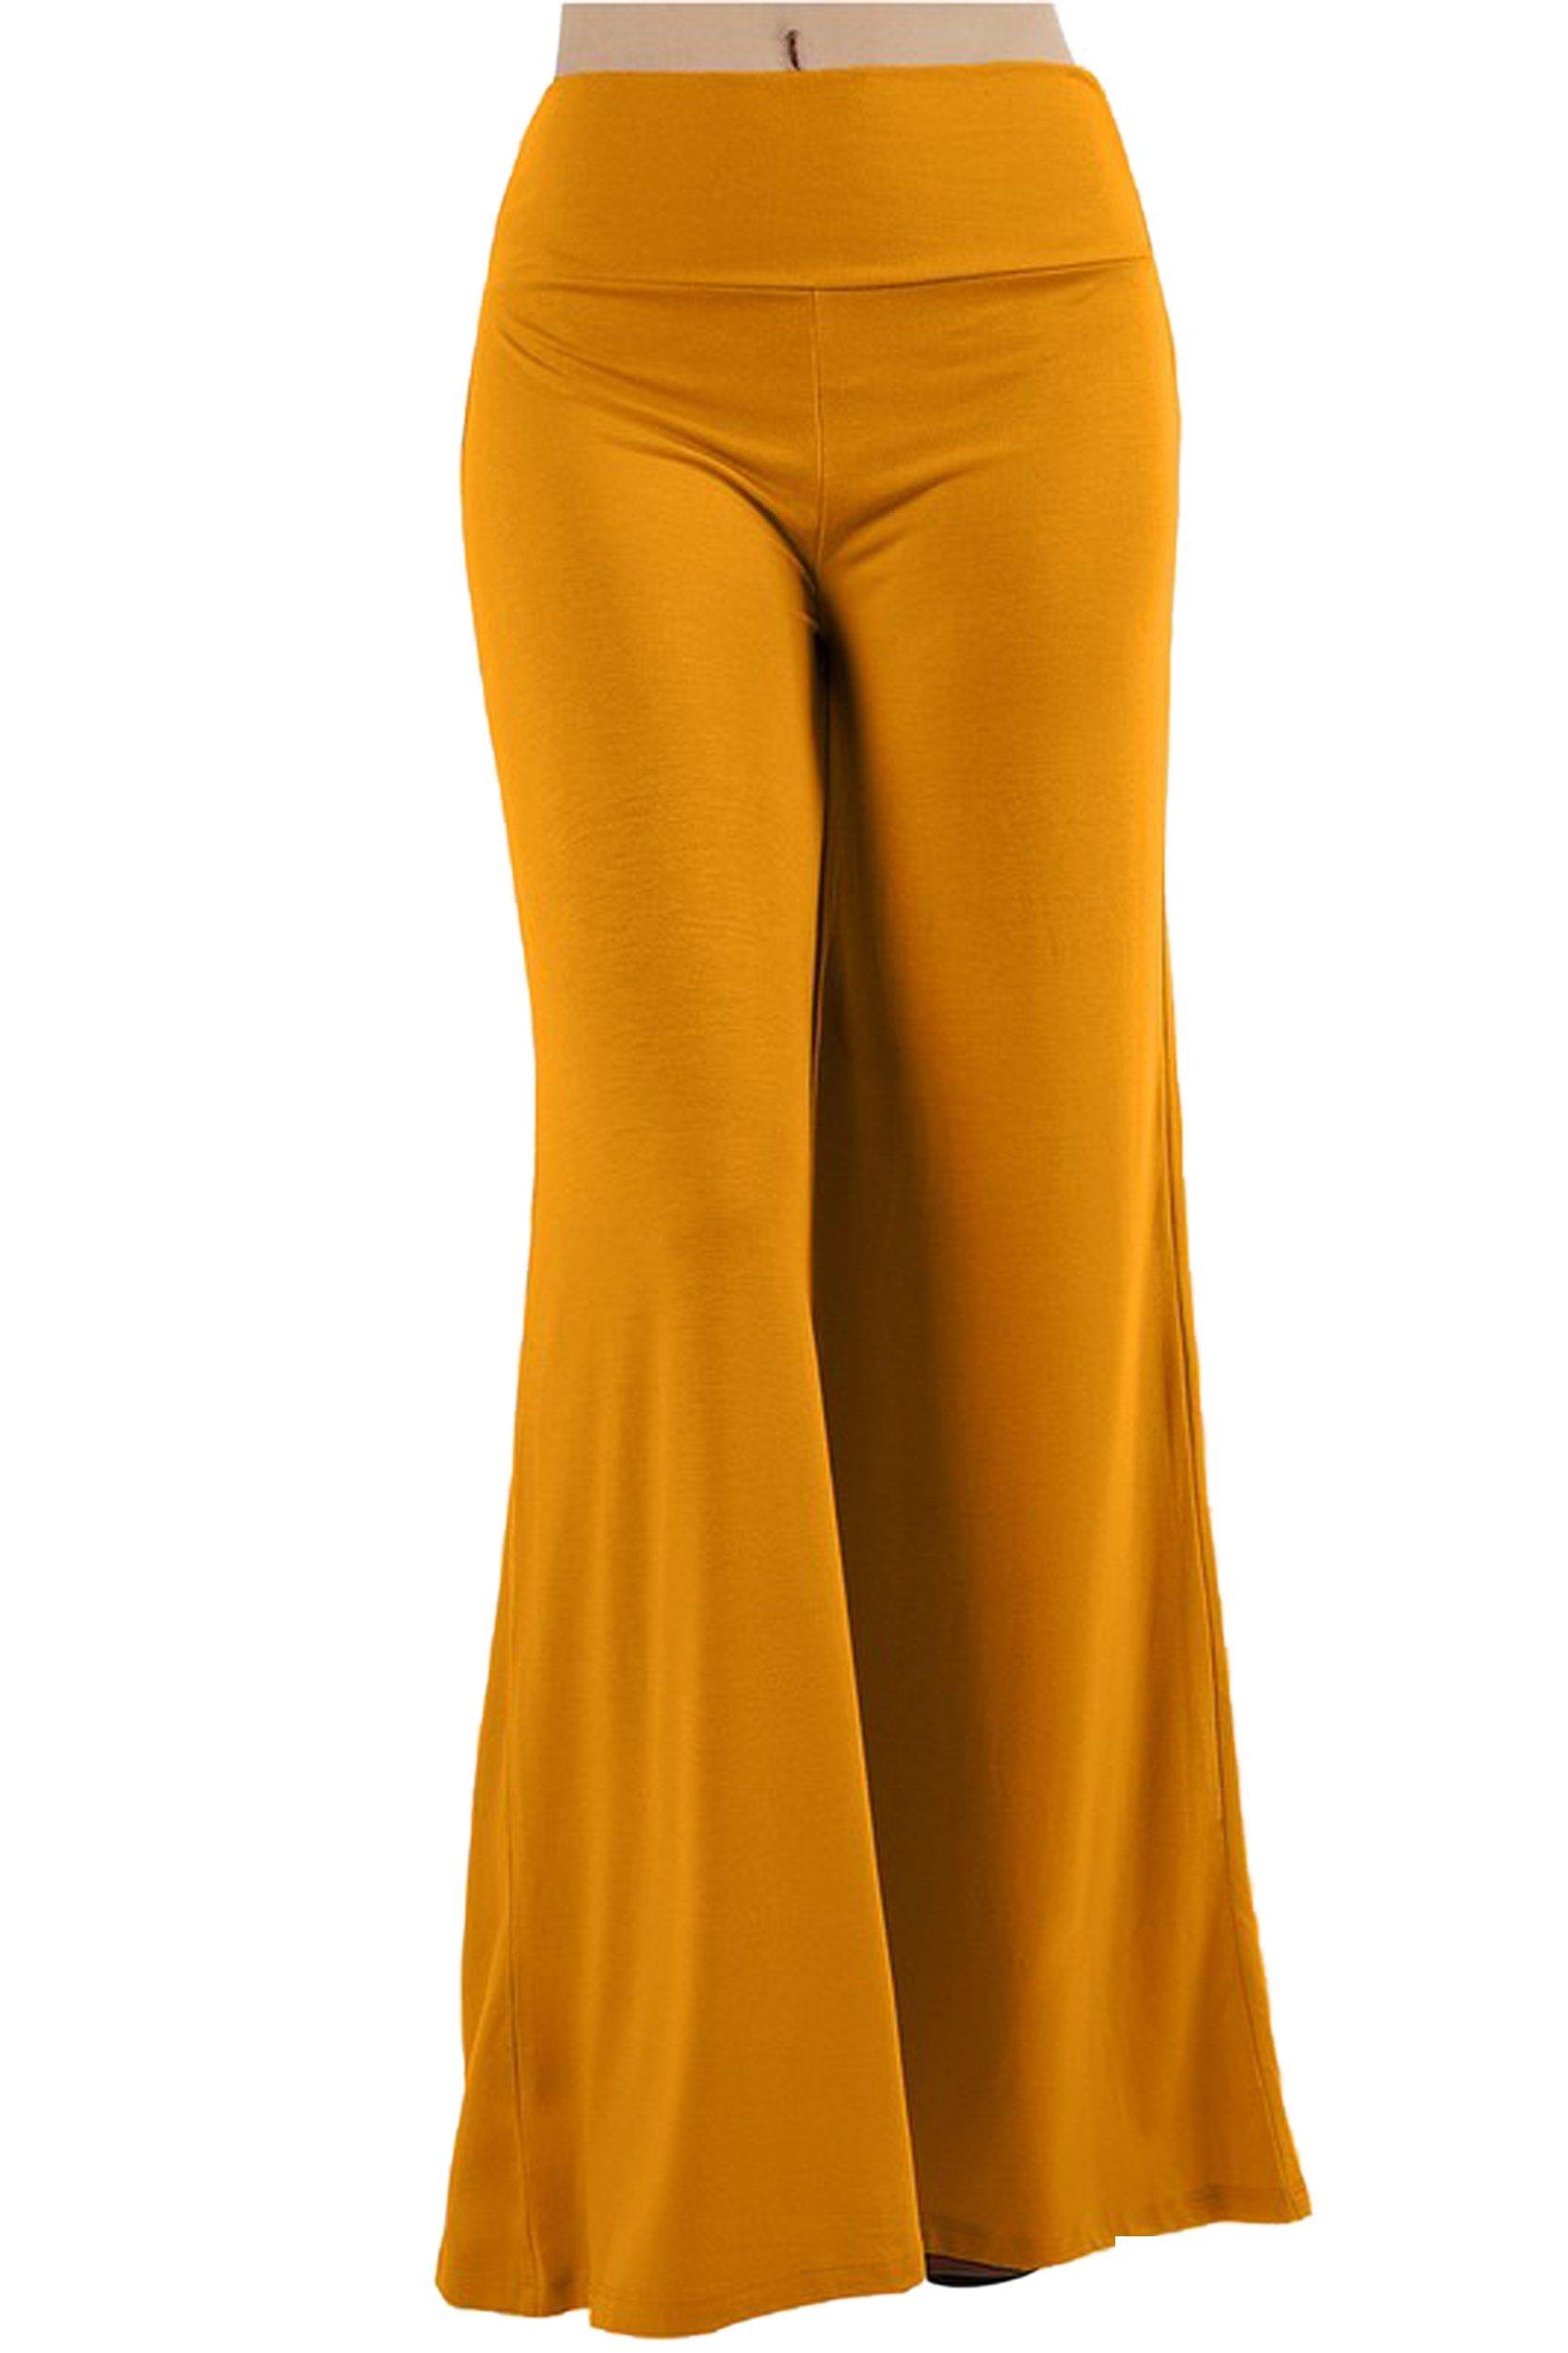 ViiViiKay Women's Maternity Wear Fold-over Waist Wide Leg Stretchy Palazzo Pants 79P_DKMUSTARD M